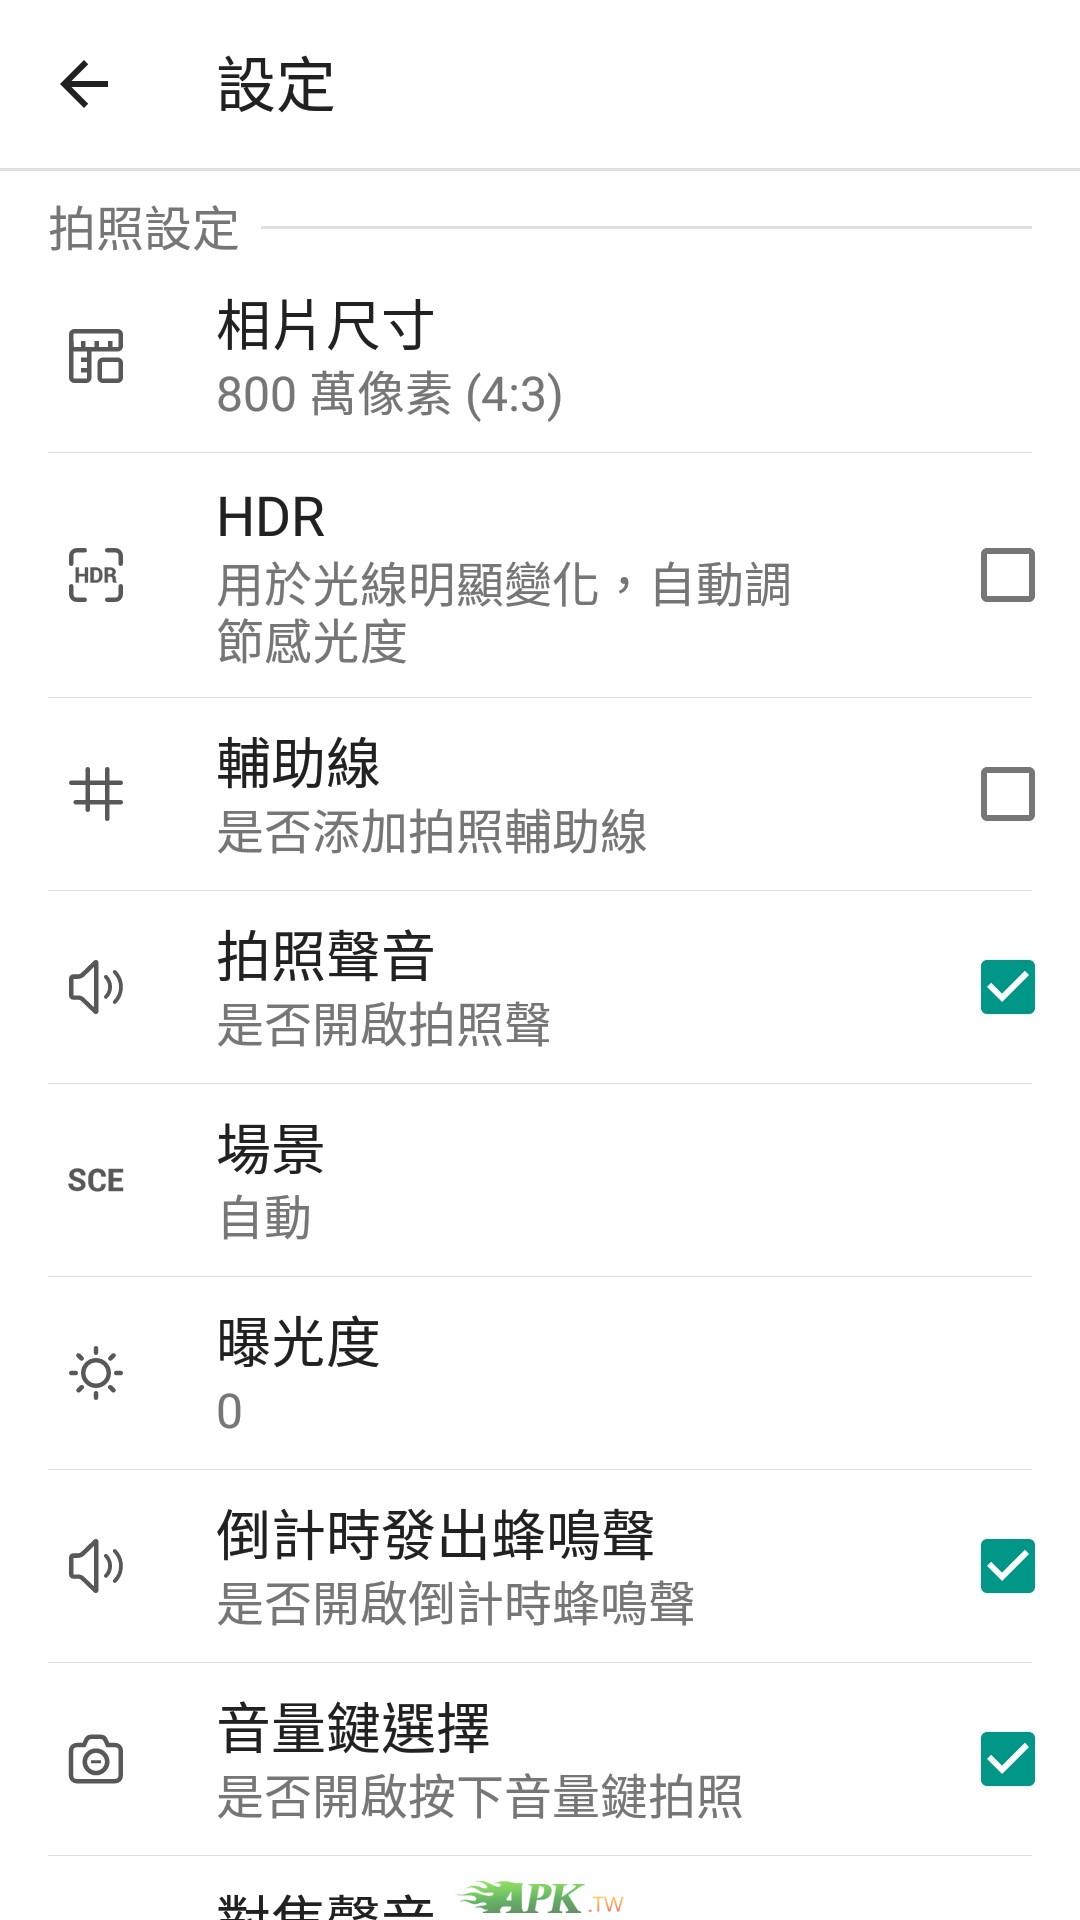 HDCamera_Pro_4.8.1.0_3.jpg